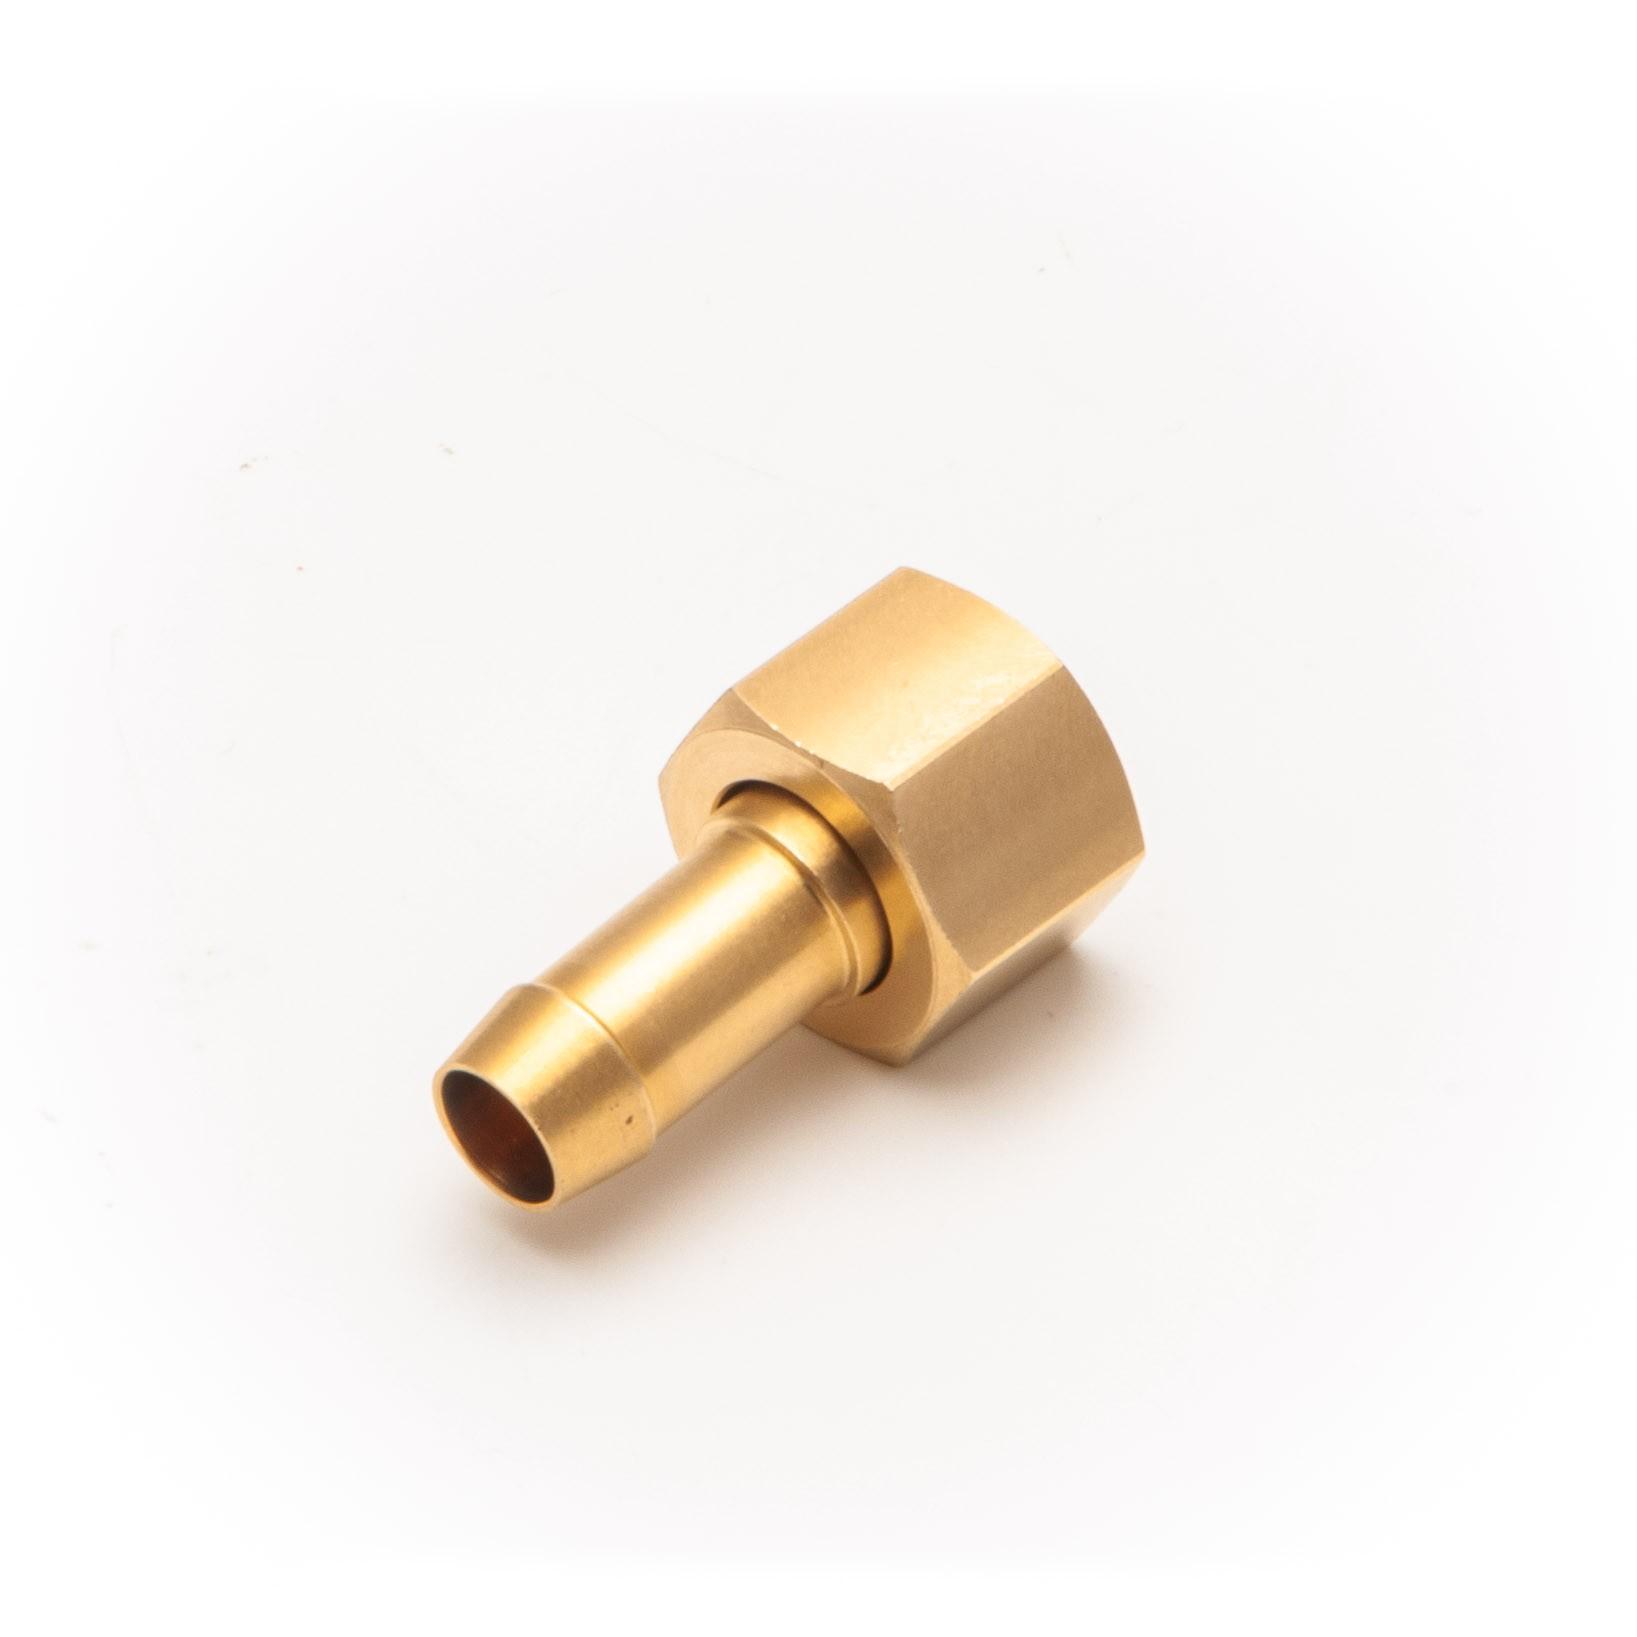 Connection for AZX Fuel Pumps - 5/16 Hose image #1